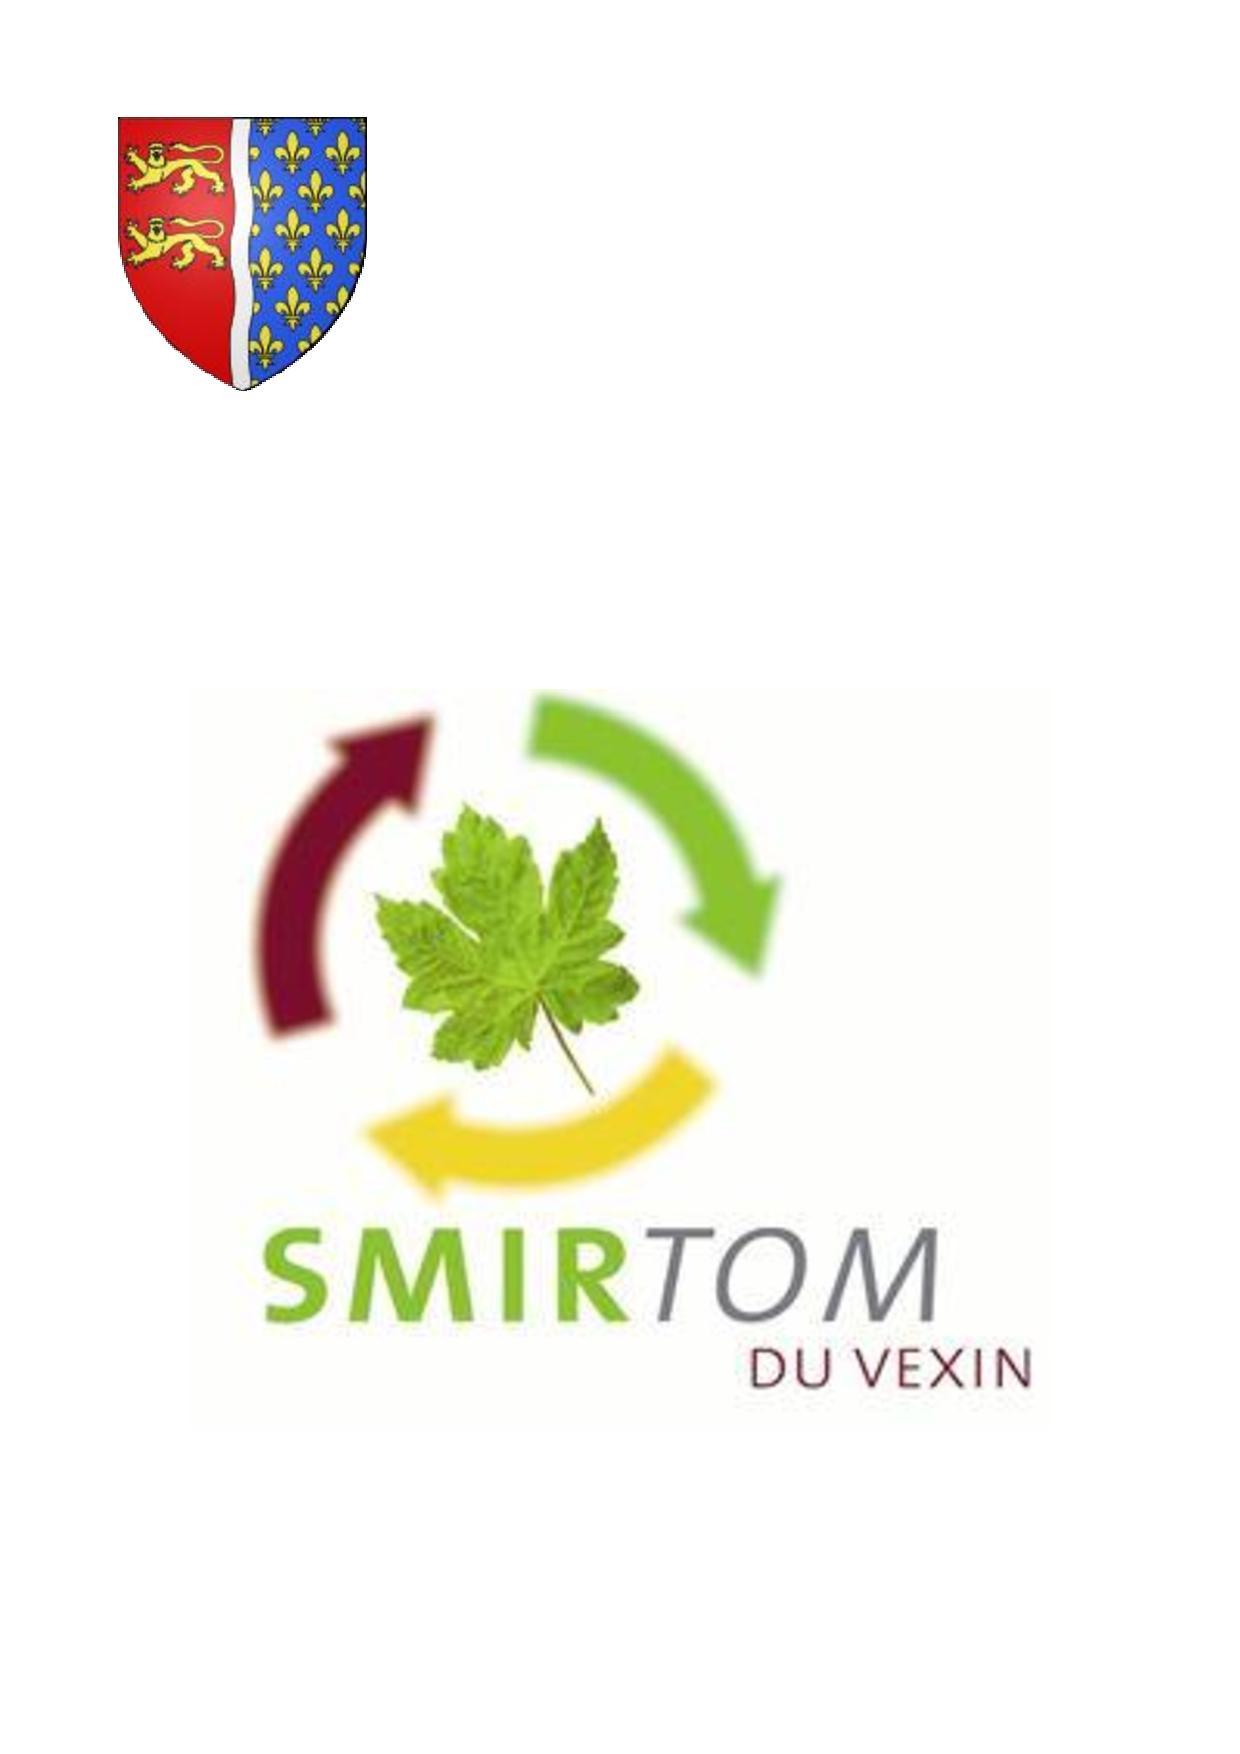 Smirtom Du Vexin Calendrier 2021 Calendrier SMIRTOM   Saint Clair sur Epte